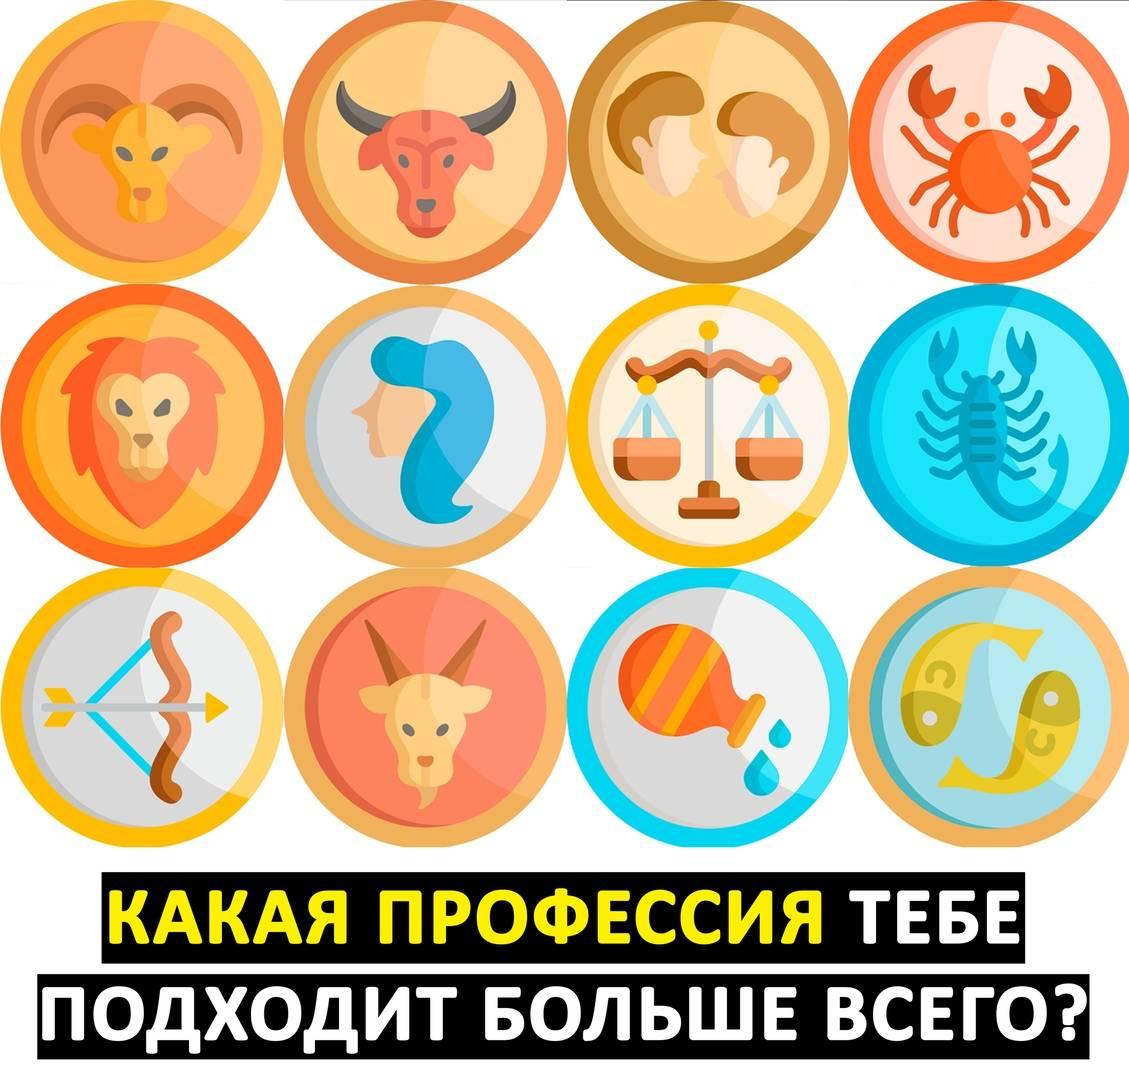 Знаки зодиака и профессии, а у вас они совпадают? | kaspyinfo.ru